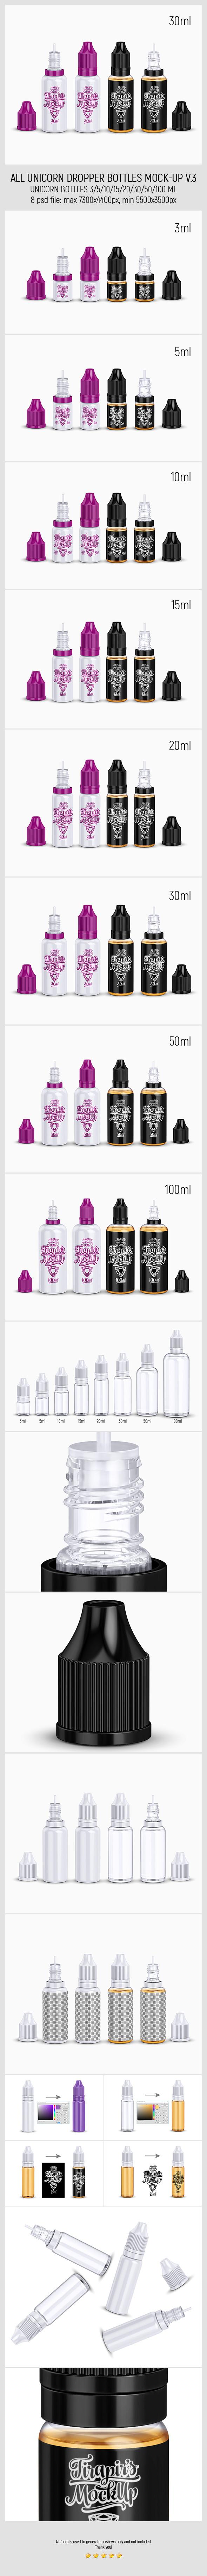 All Unicorn Dropper Bottles Mock-up v.3